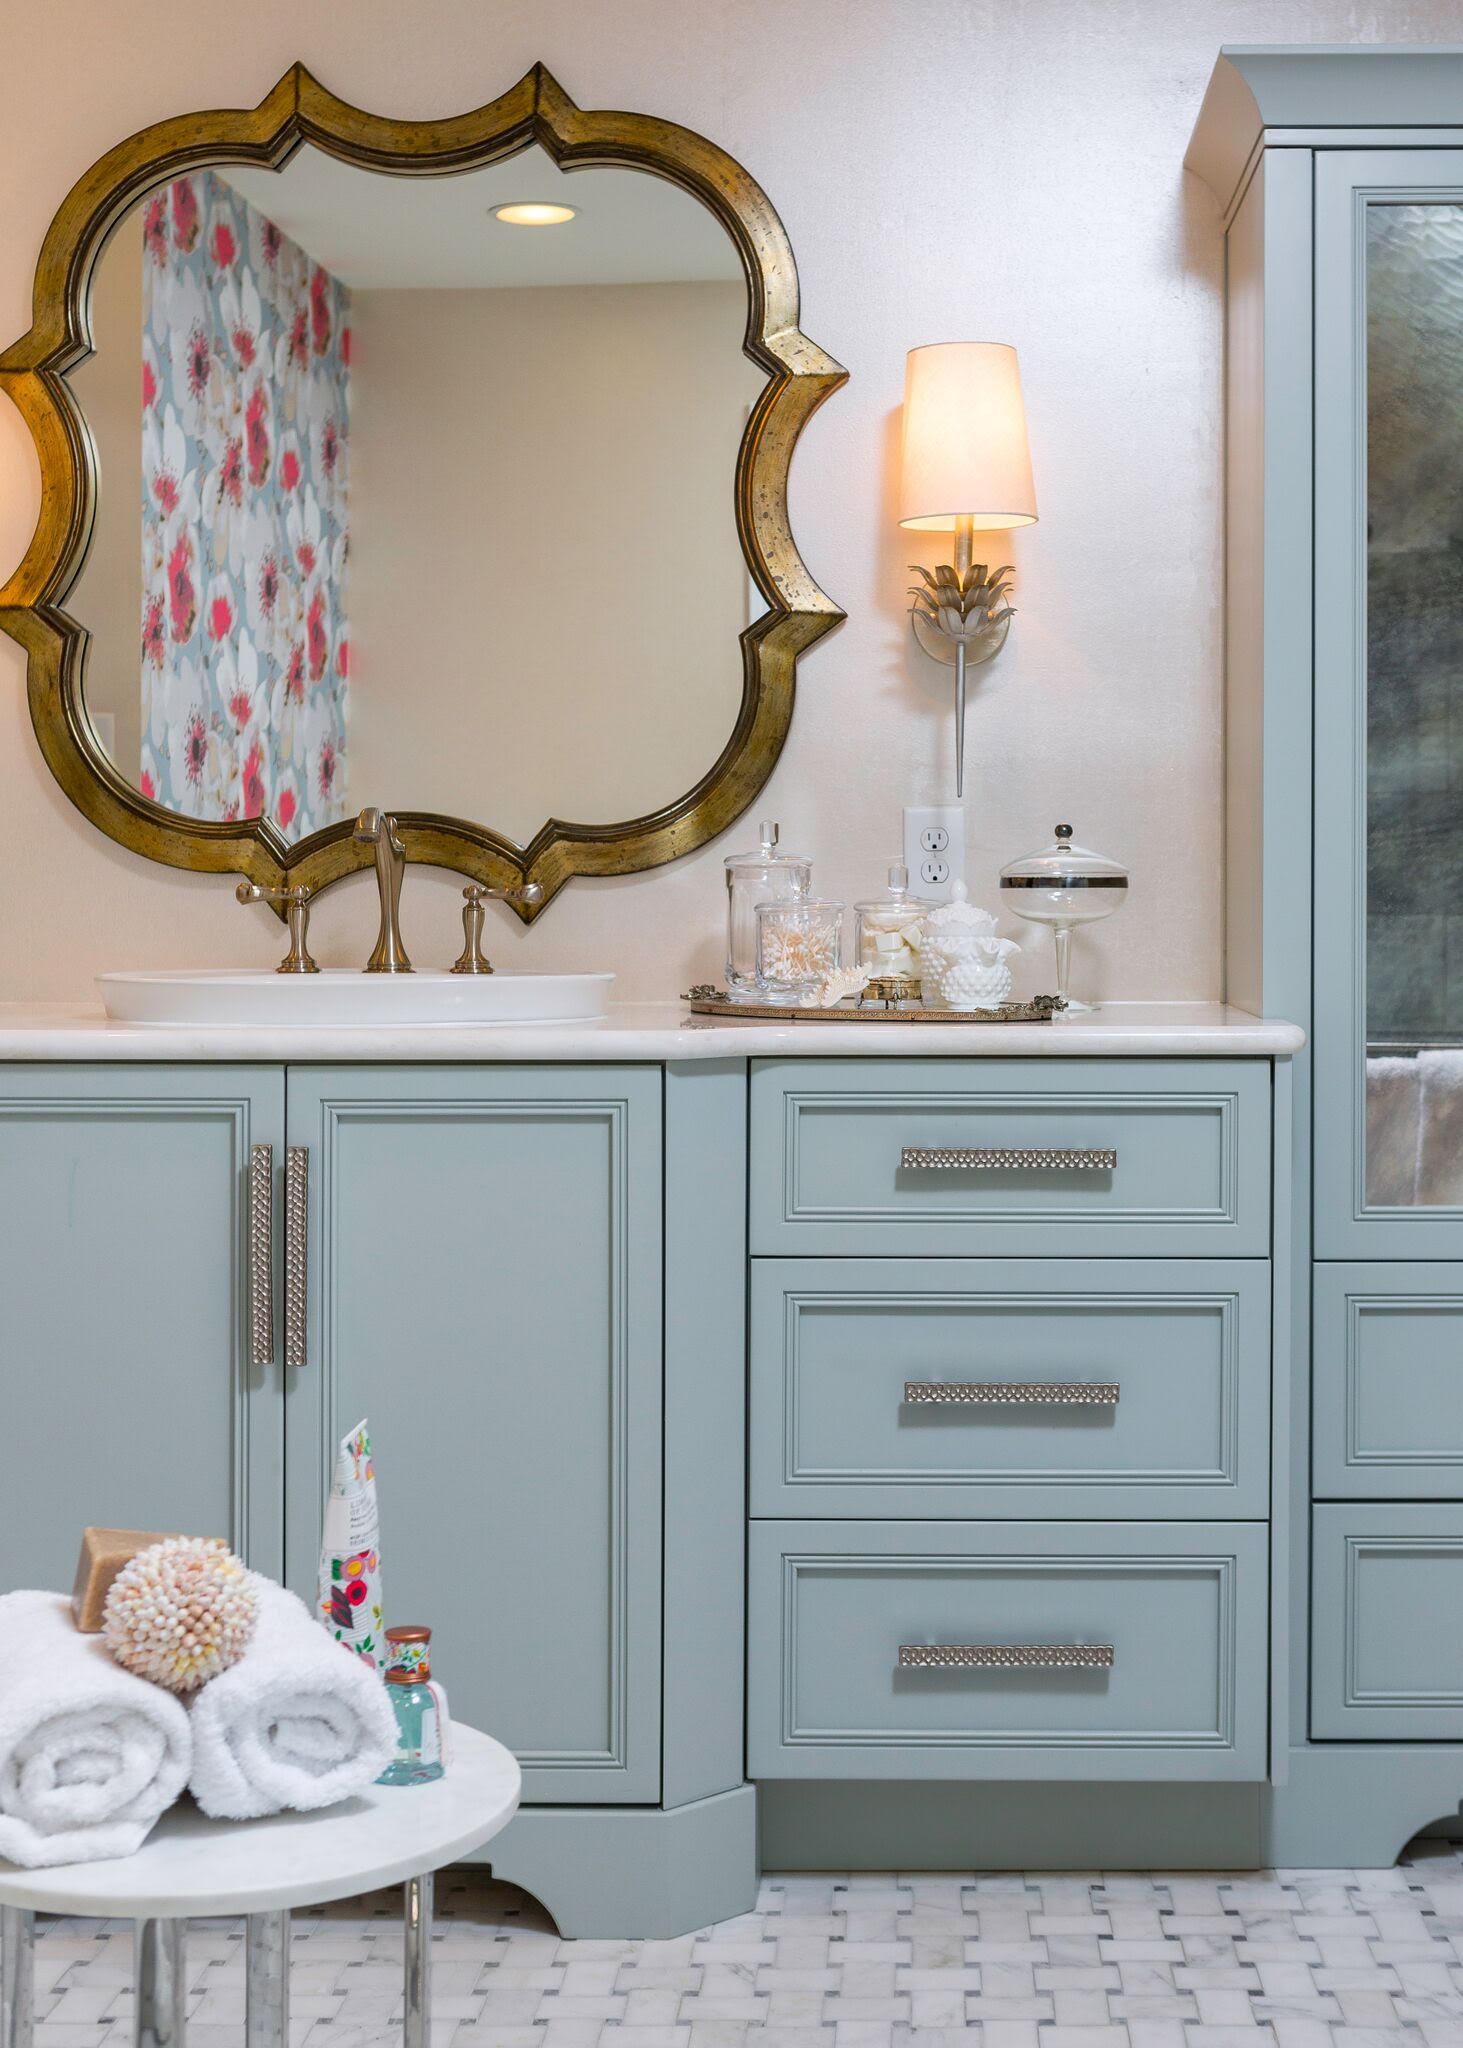 DESIGNER SPOTLIGHT - Cheryl Kees Clendenon, #marblefloor #bathroomdesign #gildedmirror #marblemosaic #turquoisecabinet #luxurybath